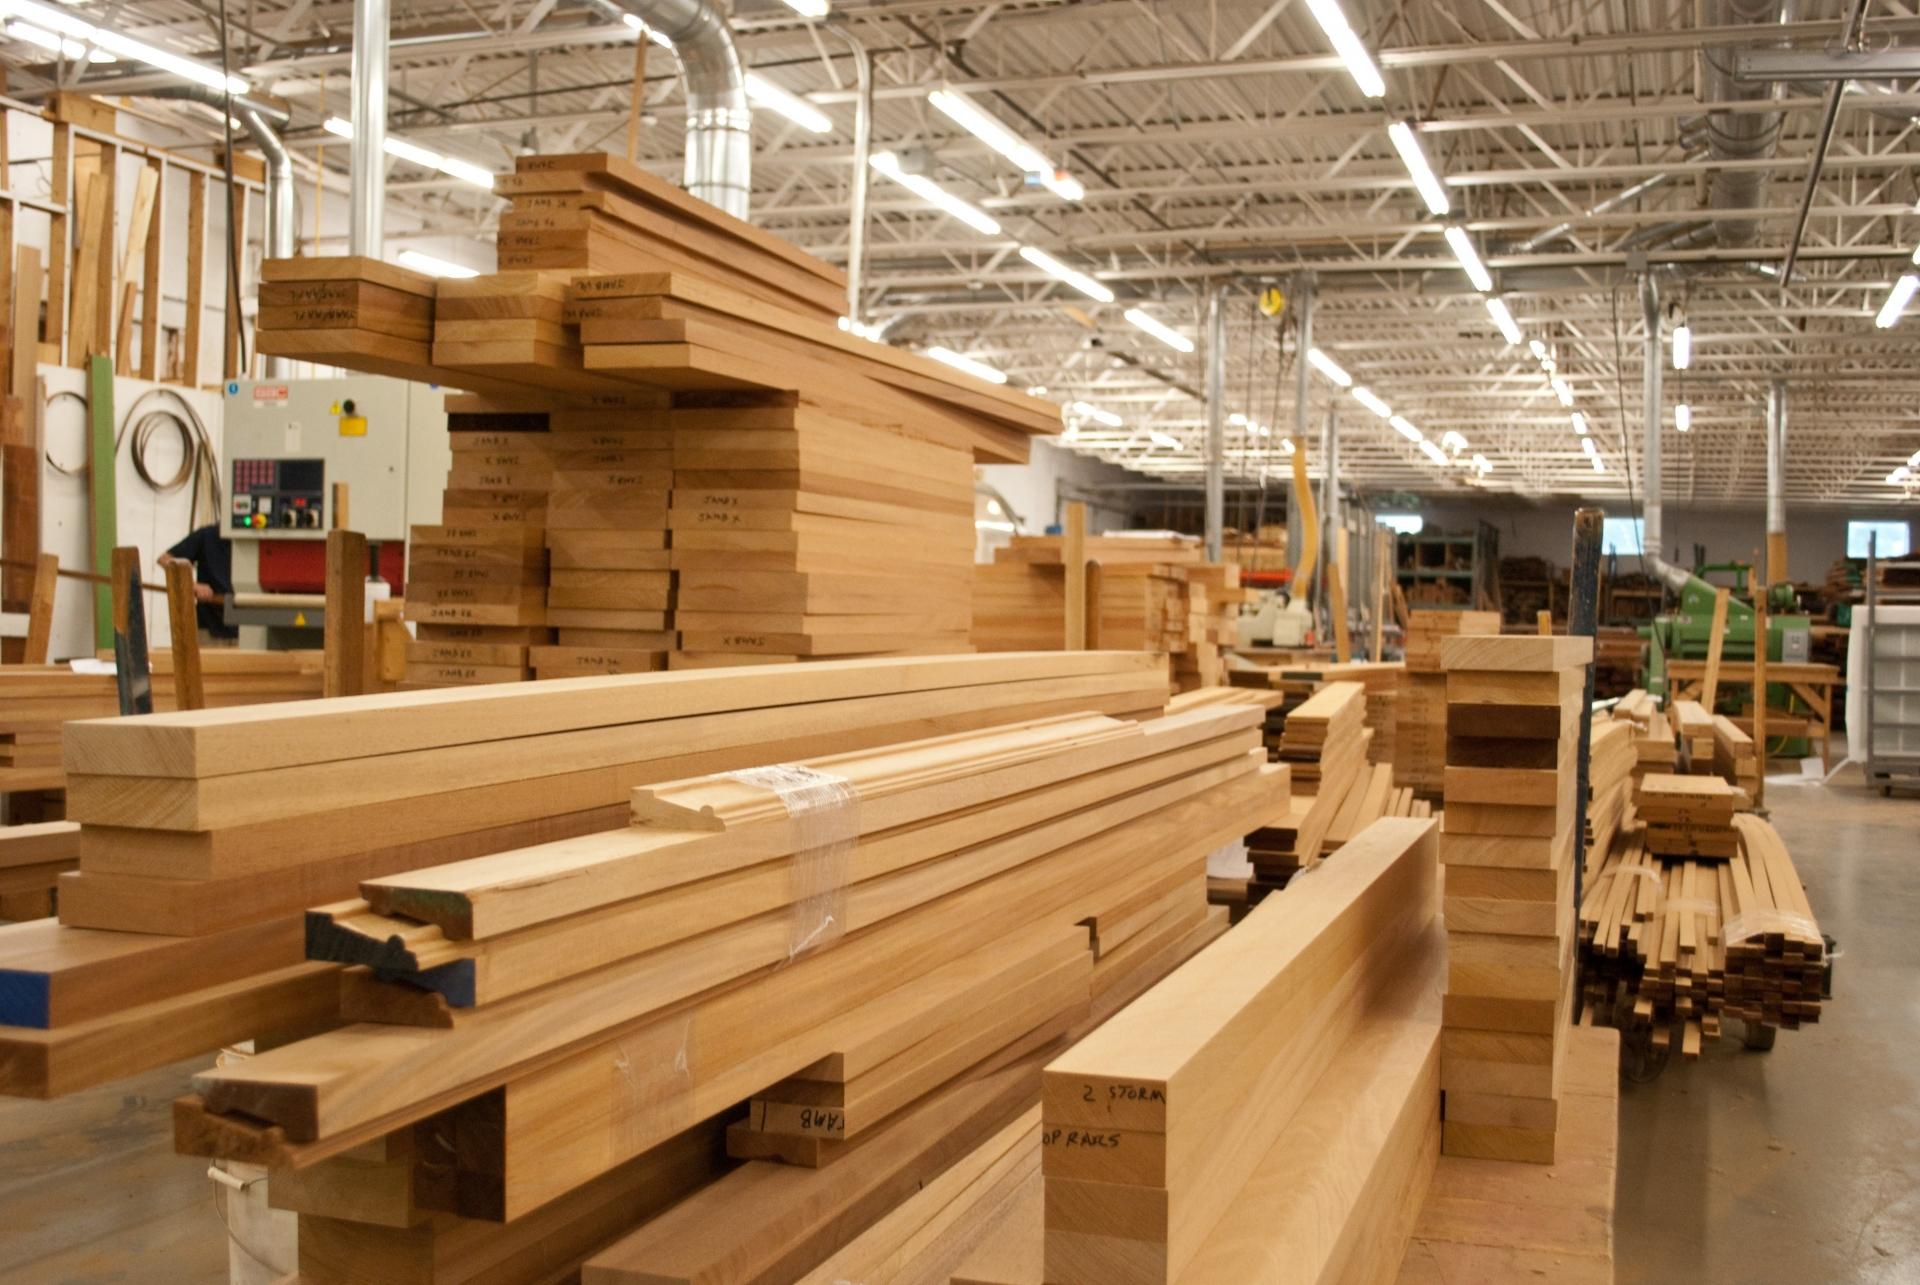 Vietnam's wood exports grow in anticipation of UKVFTA